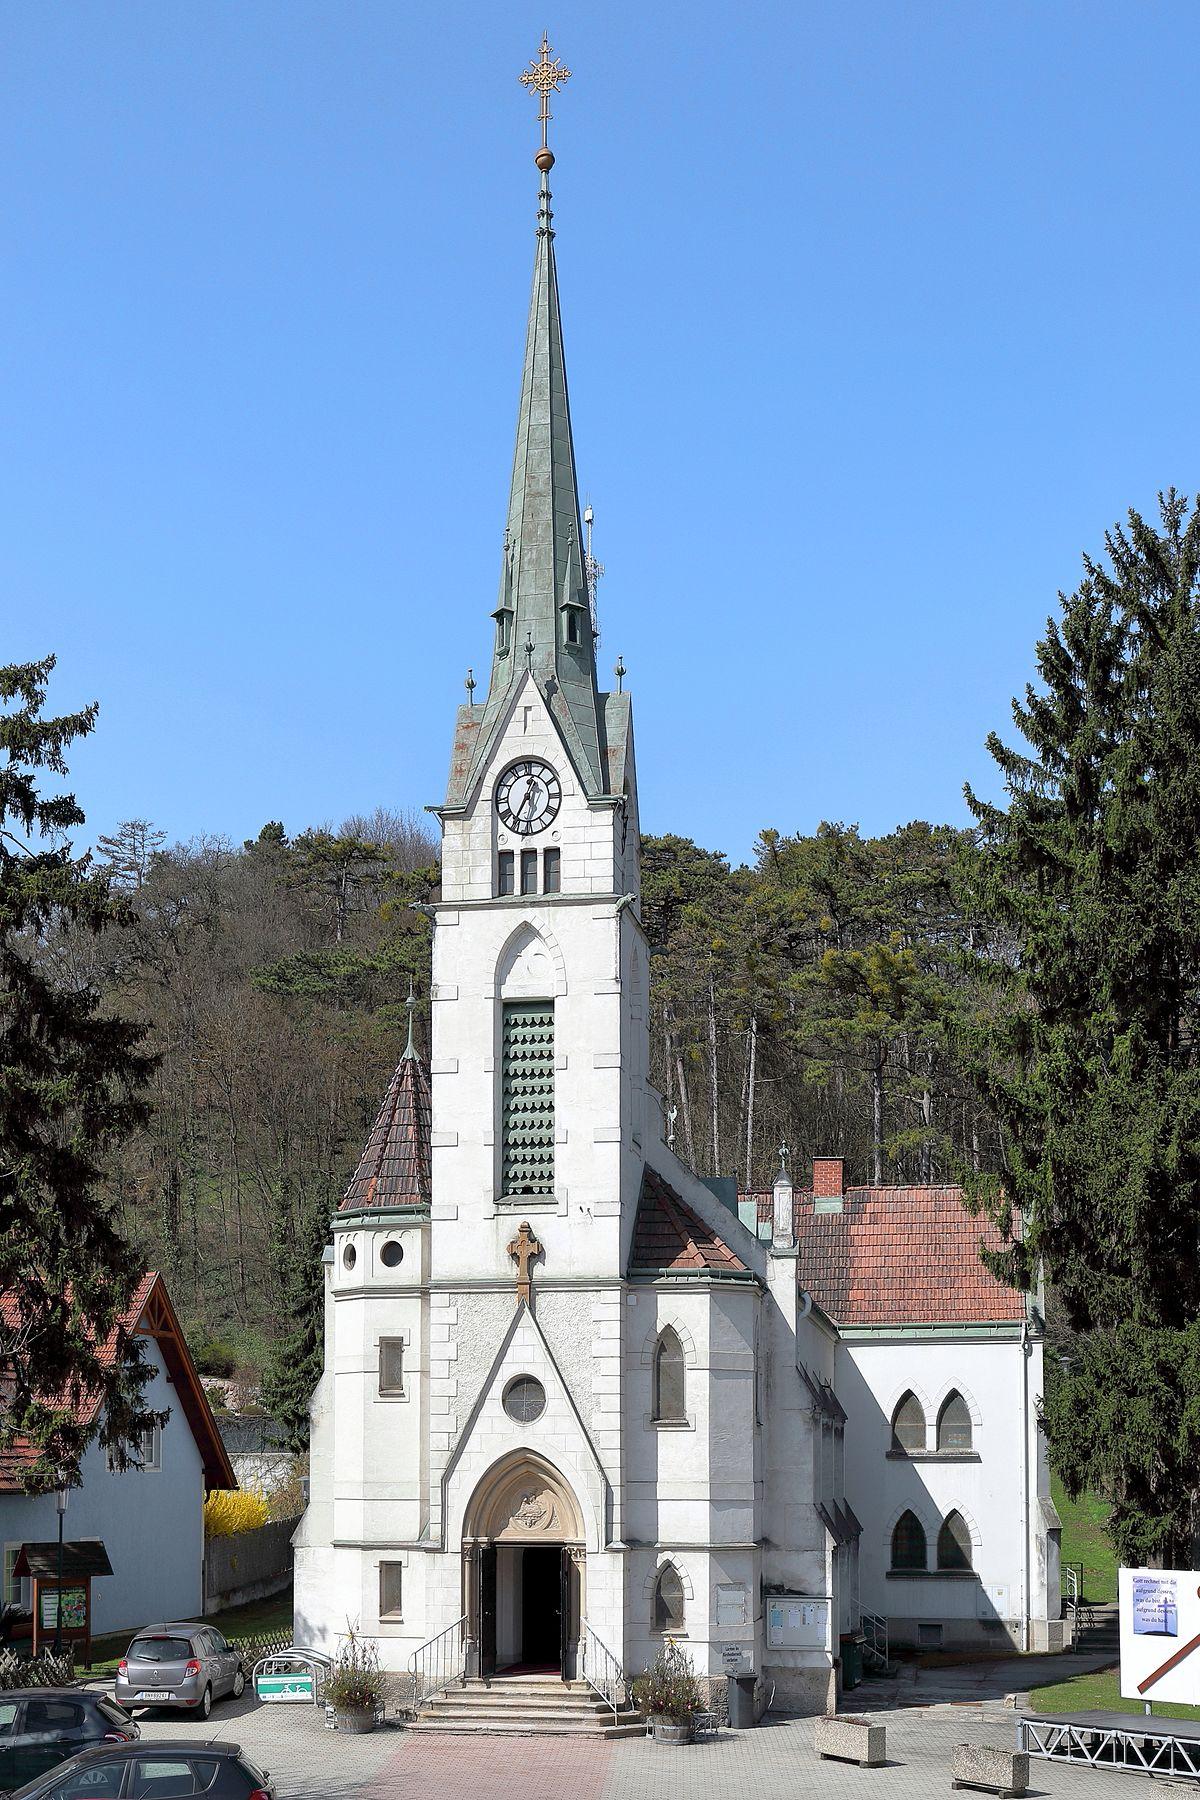 Pfarrkirche Hirtenberg Wikidata